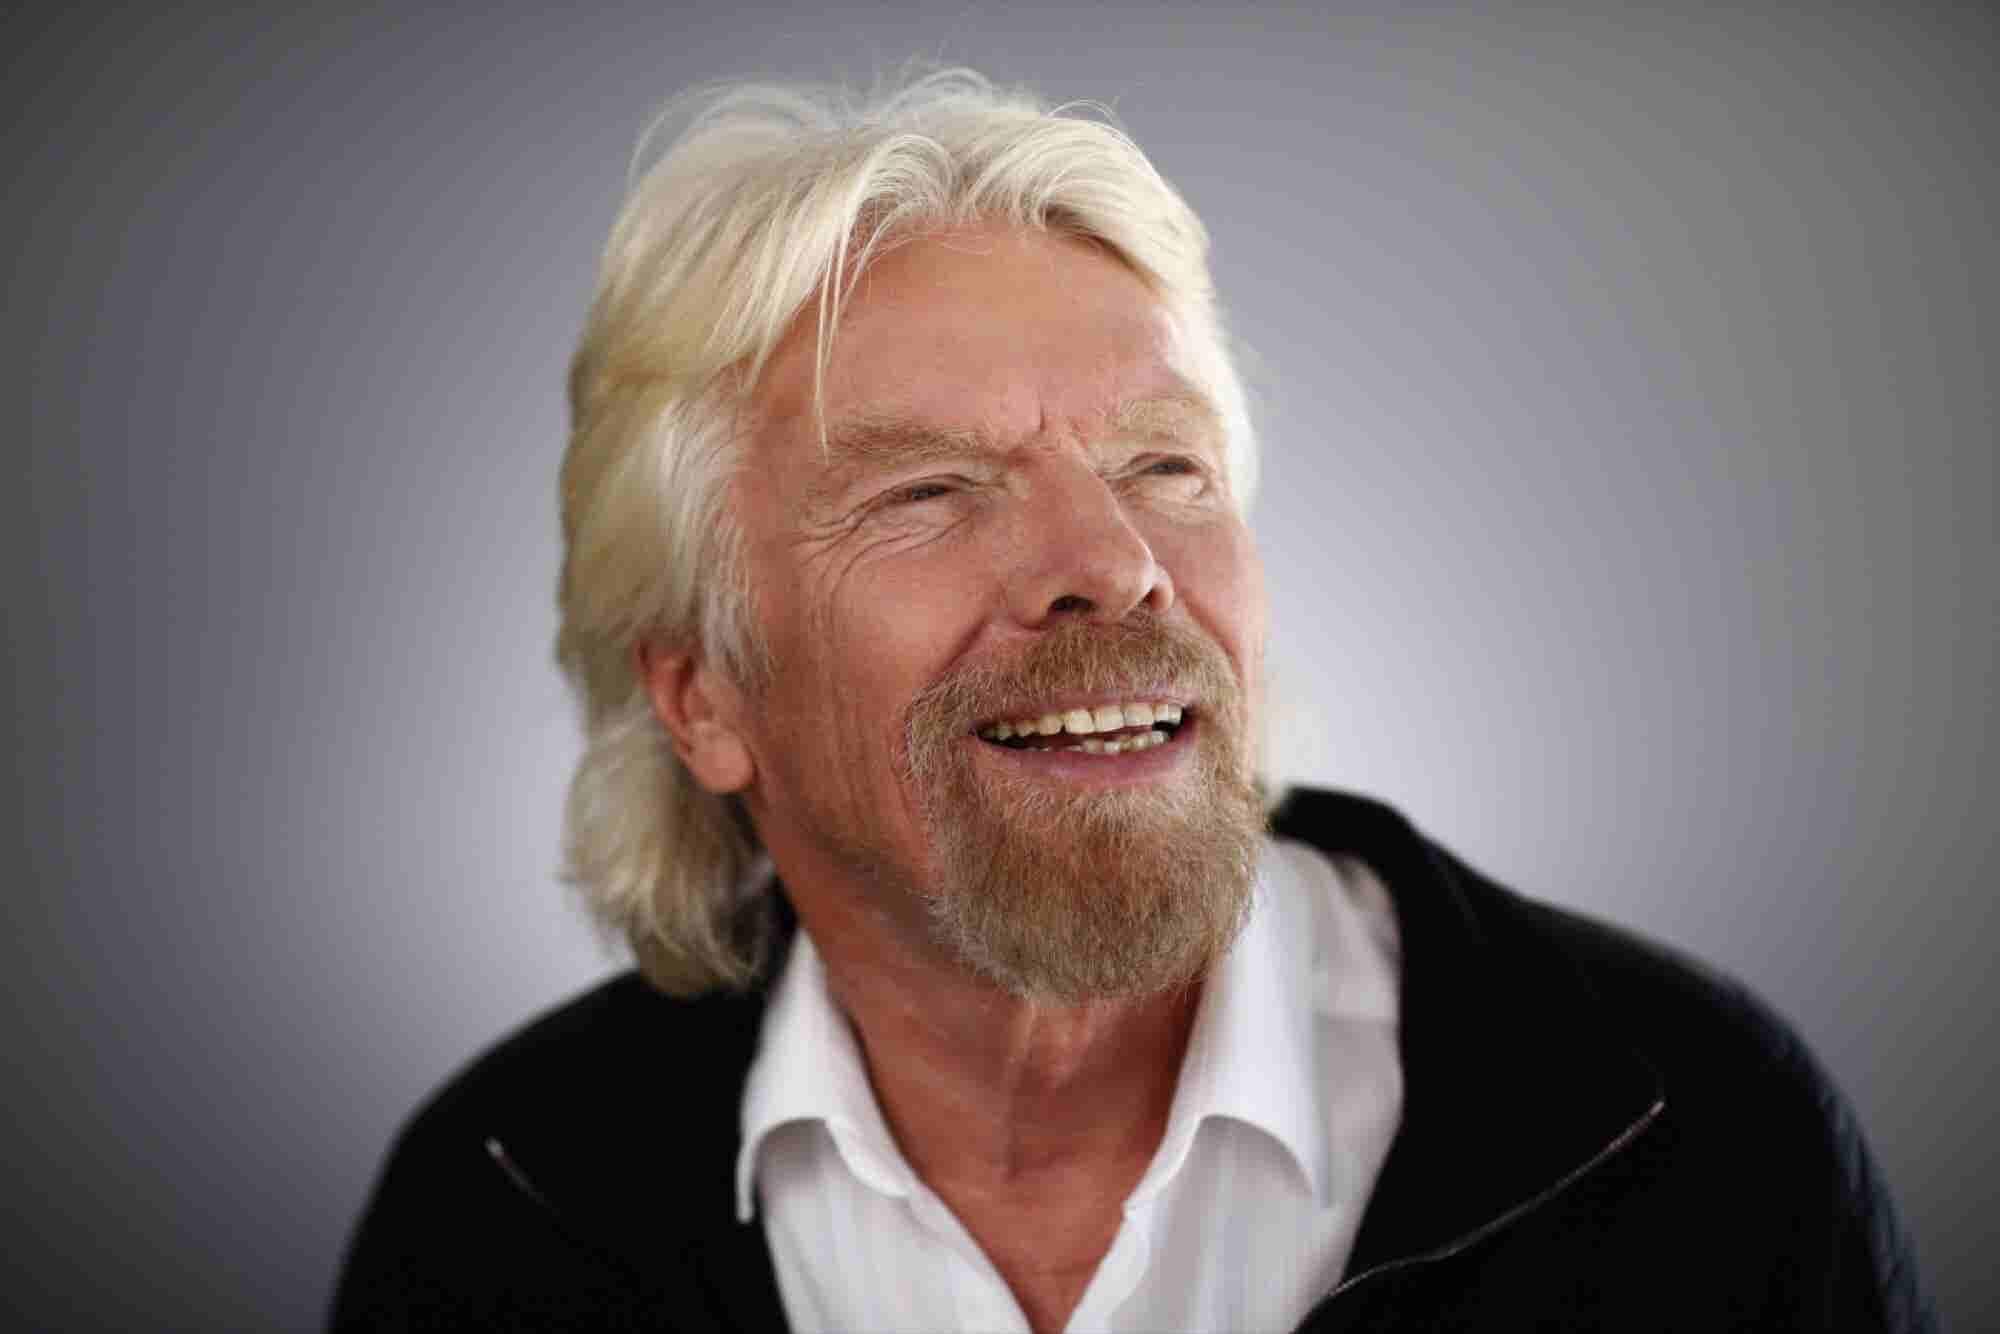 Watch Legendary Entrepreneur Richard Branson Share His Secrets to Startup Success